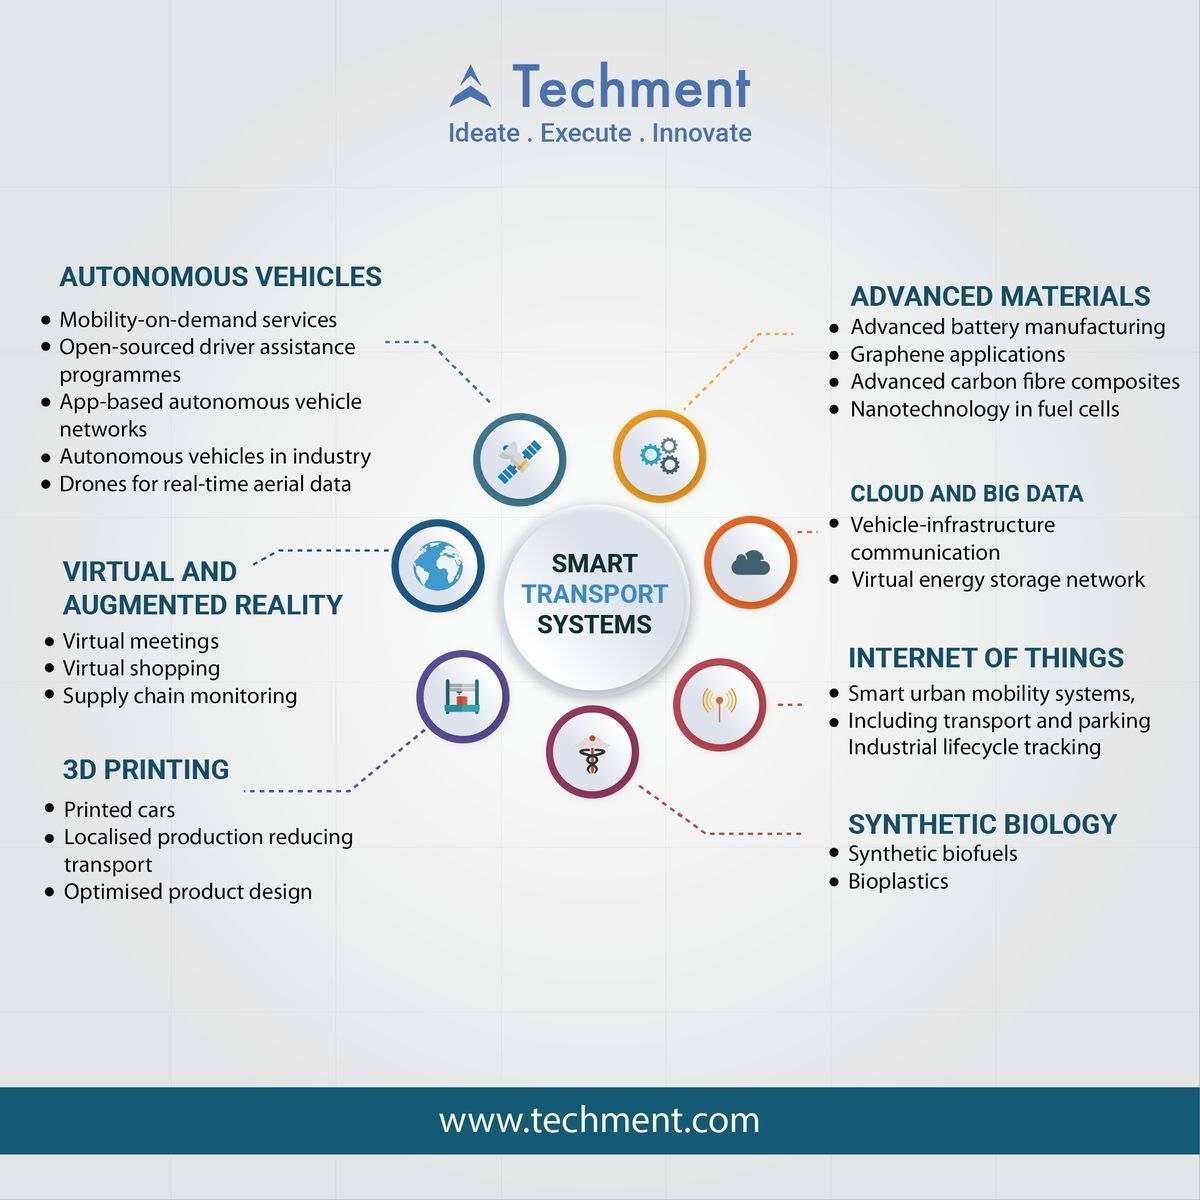 21 4ir Technology Apps For A Low Carbon Economy Pwc Via Mikequindazzi Iot Autonomous Vehicles Digital Marketing Channels Nanotechnology Big Data